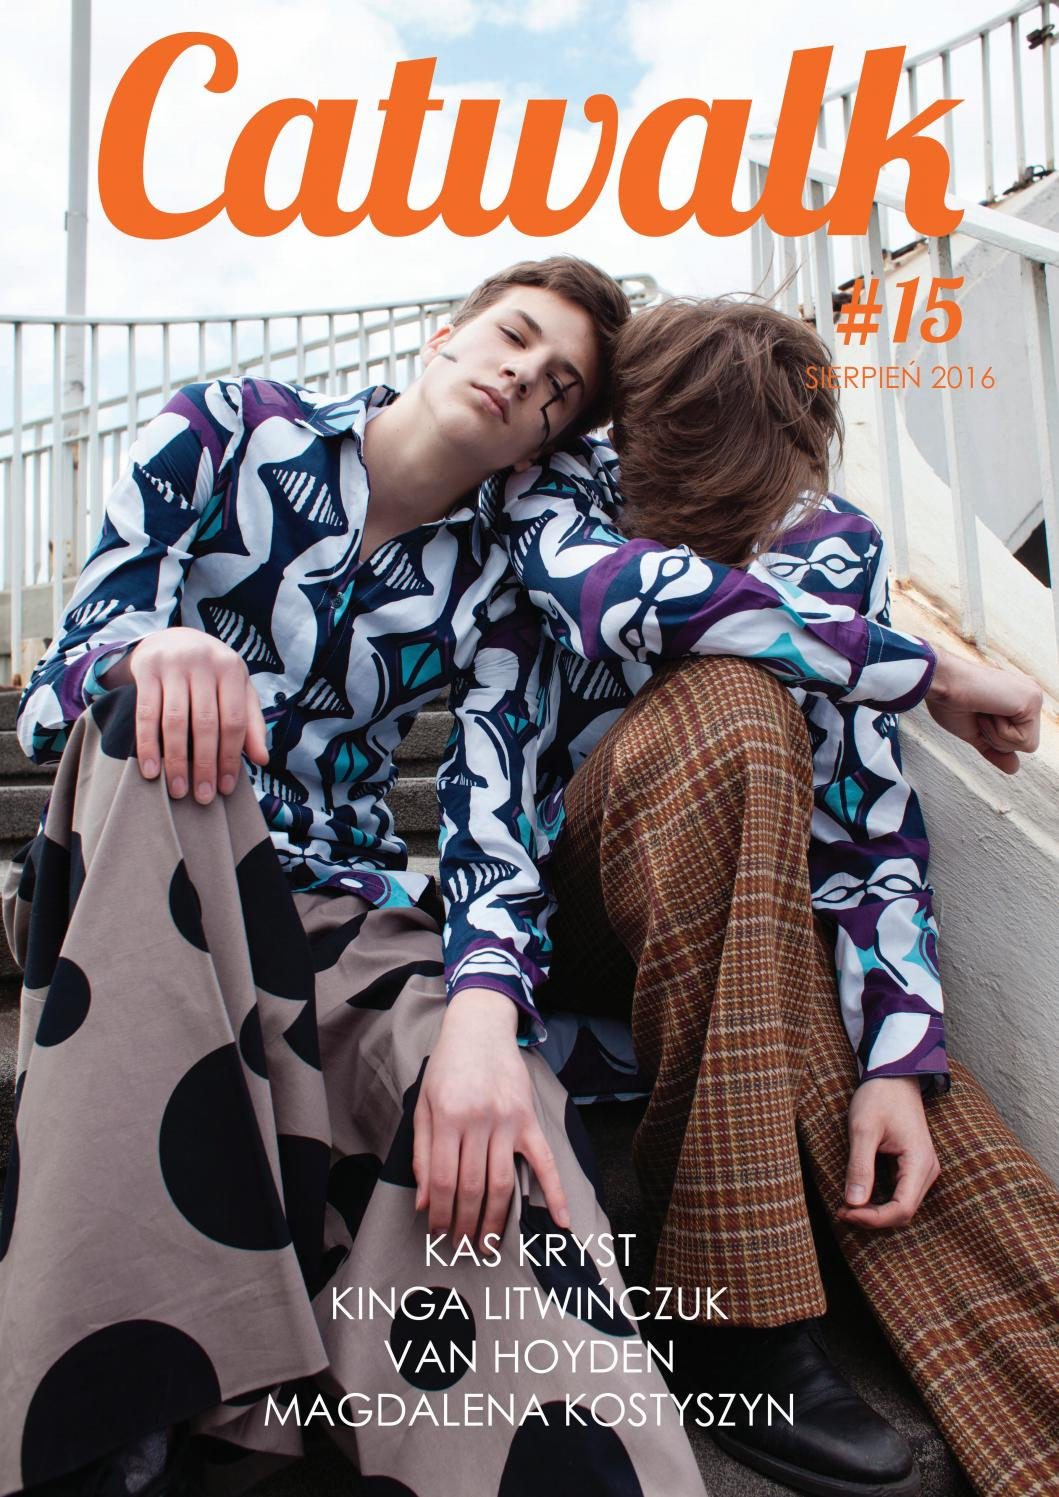 3f5543e04a Catwalk  15 by Catwalk Magazine - issuu